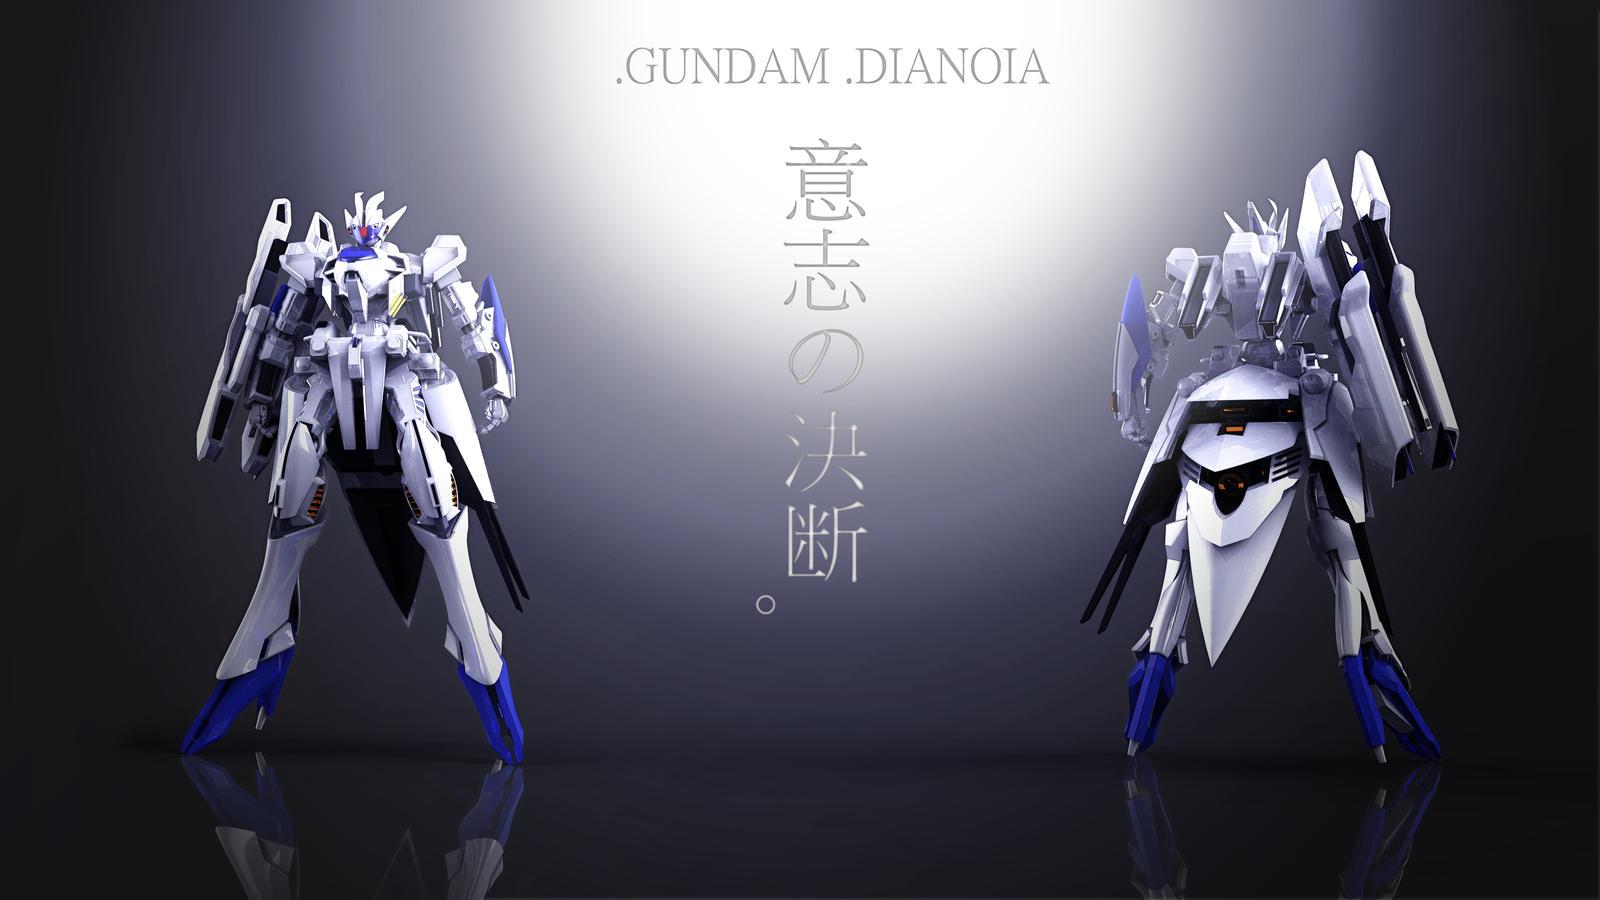 Gundam Dianoia by masarebelth